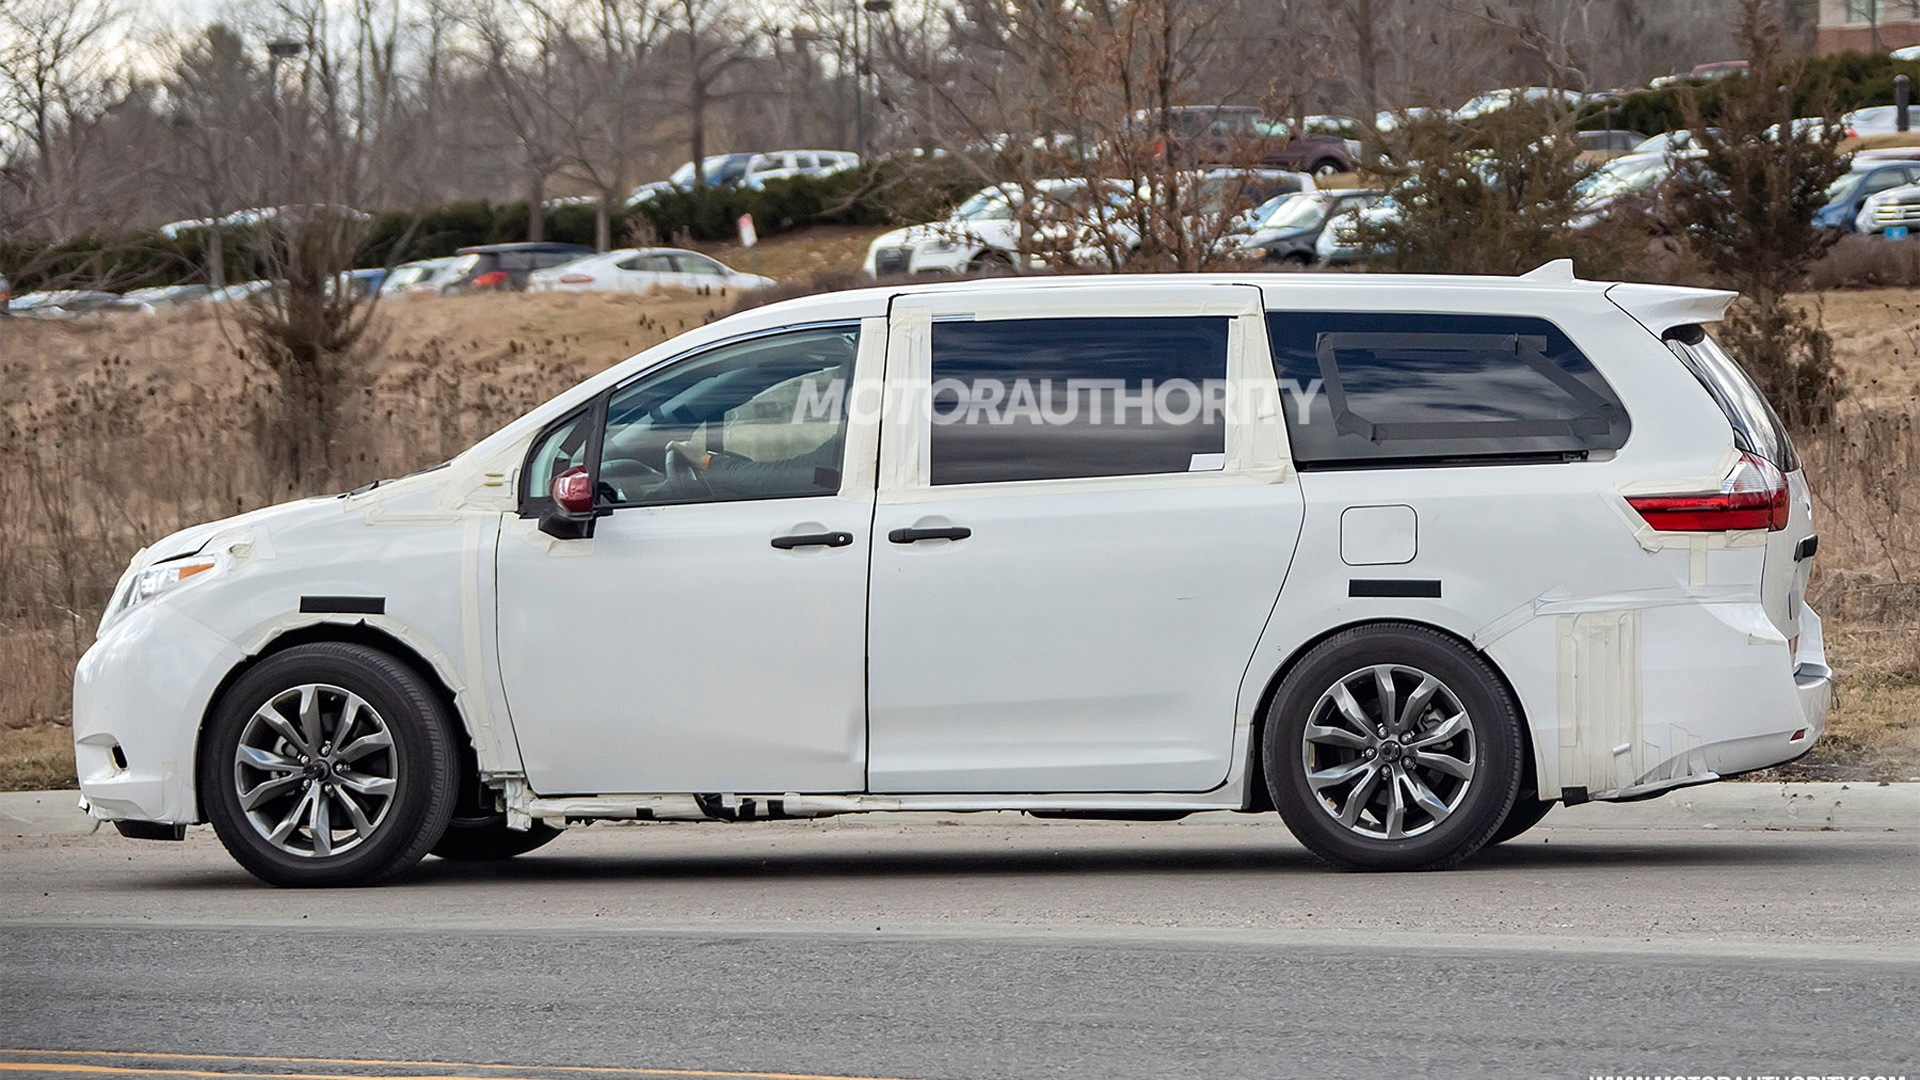 2021 Toyota Sienna test mule spy shots - Image via S. Baldauf/SB-Medien